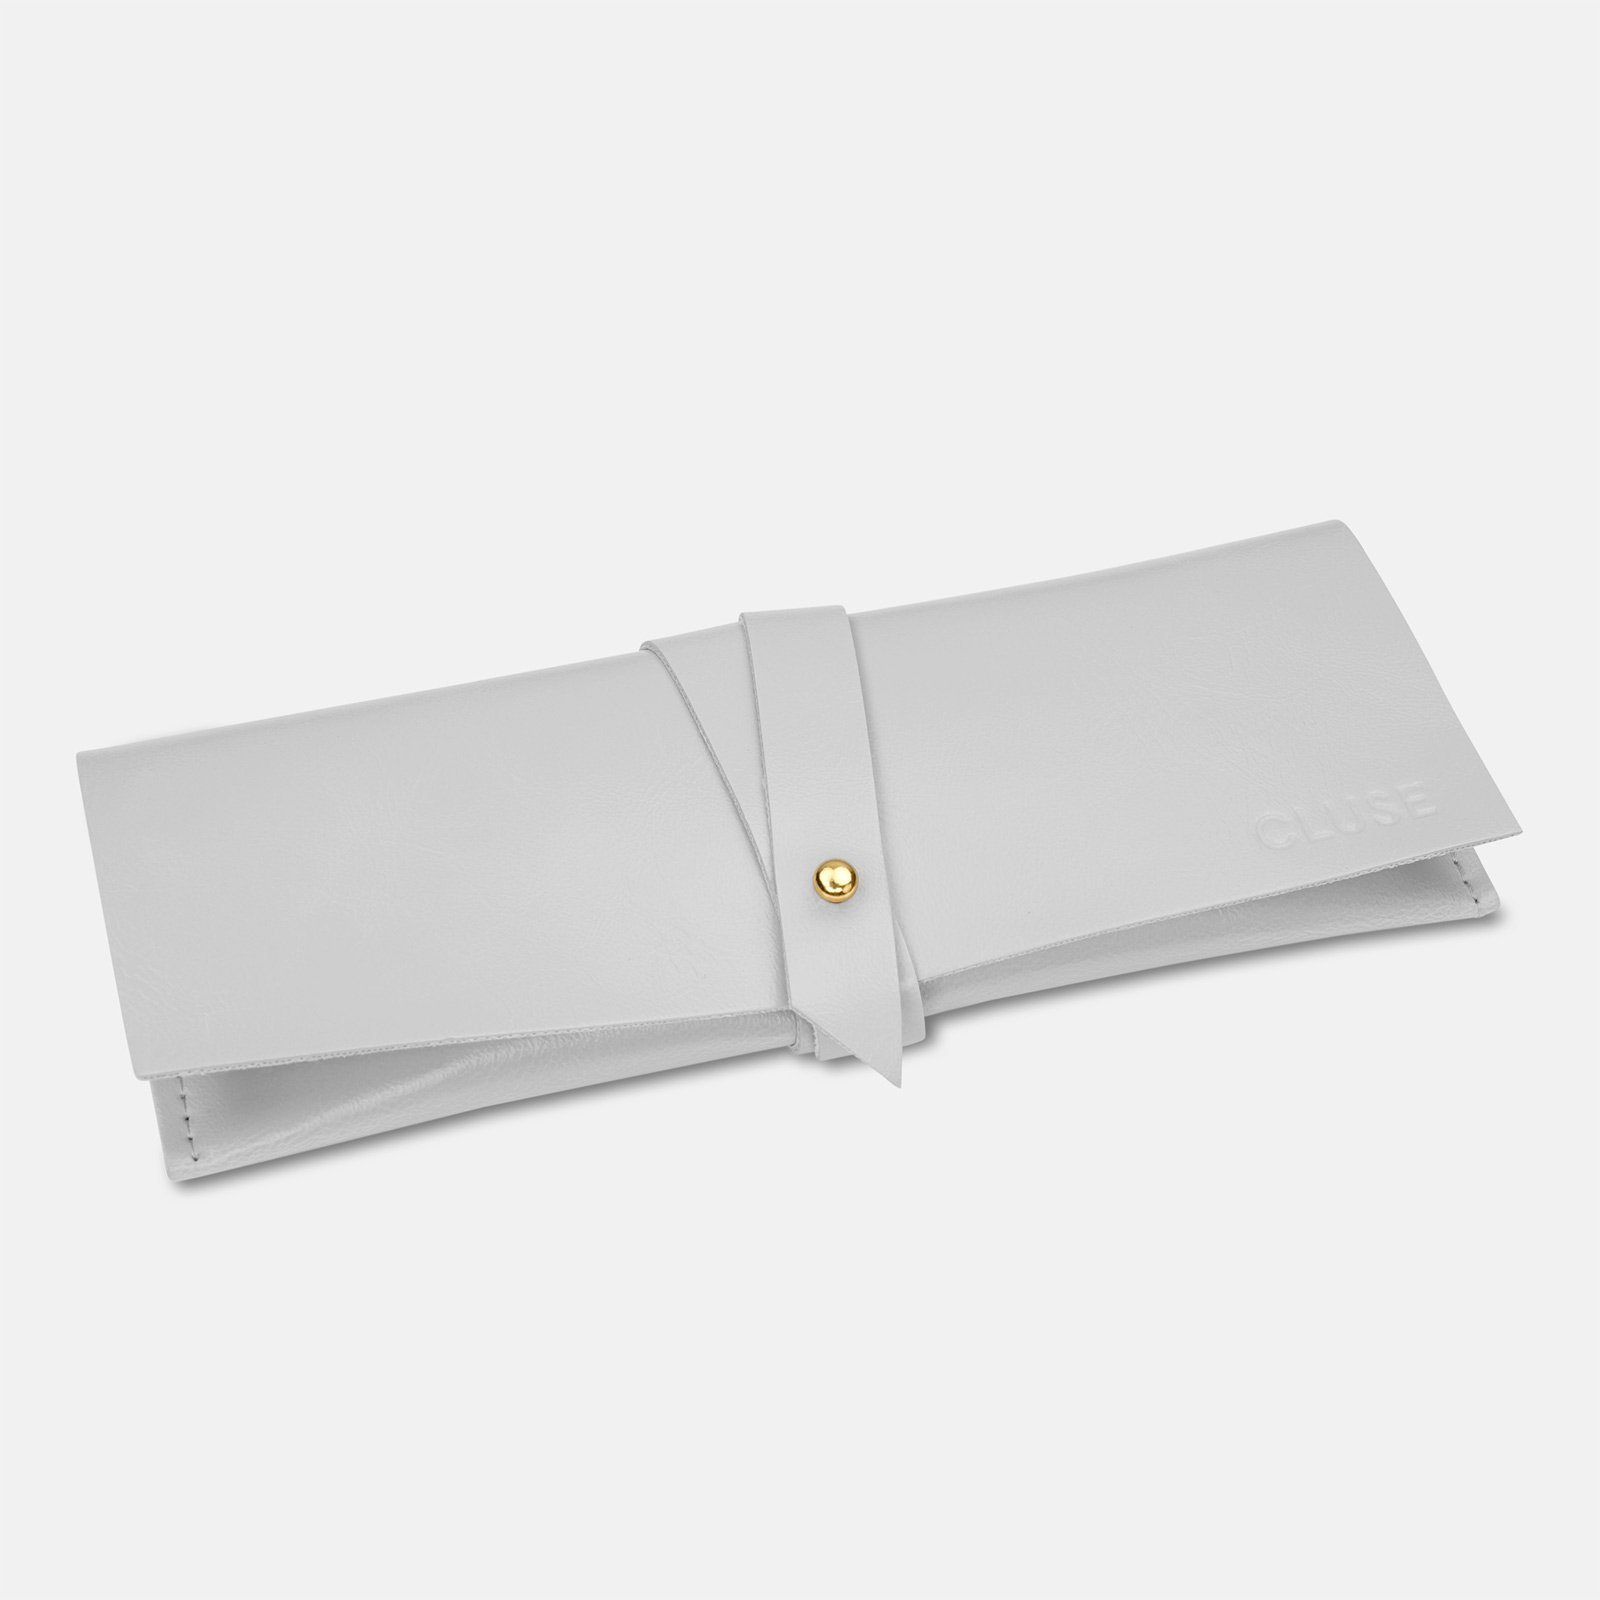 pouch_leather_2_1600x1600_45a1cb47-3fd3-4f8e-b262-a14d8c2e80c0.jpg